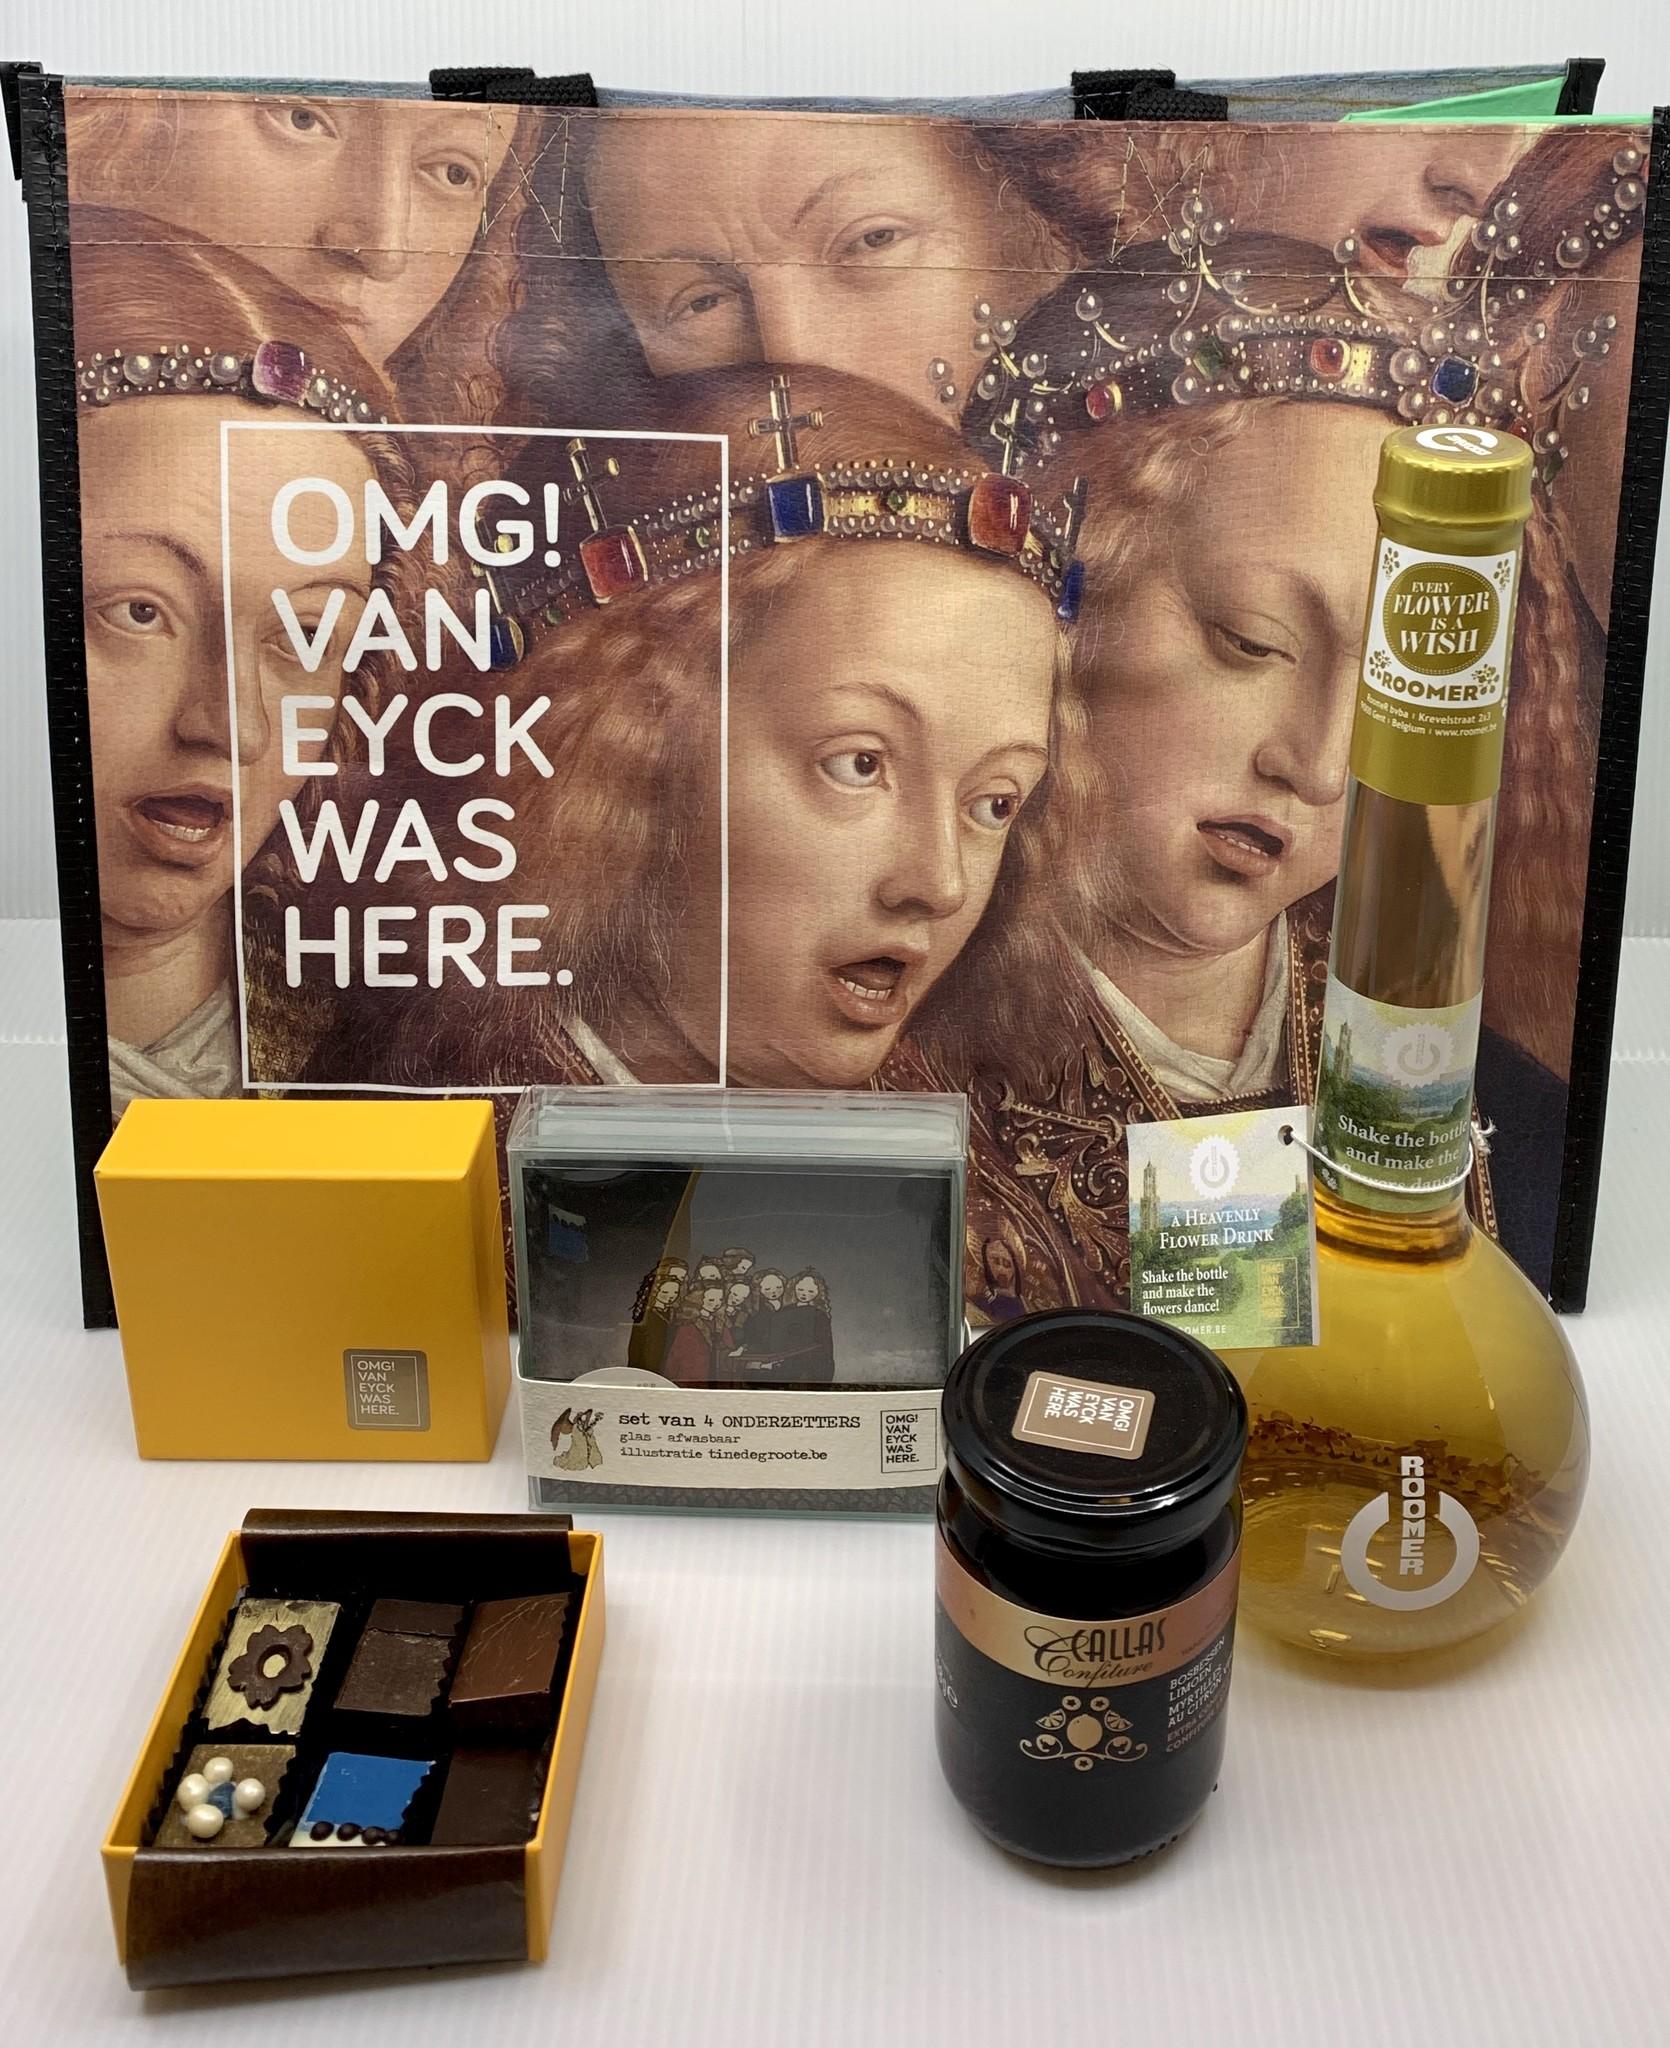 Van Eyck shop Cadeaupakket 'Santé & Smakeleyck'